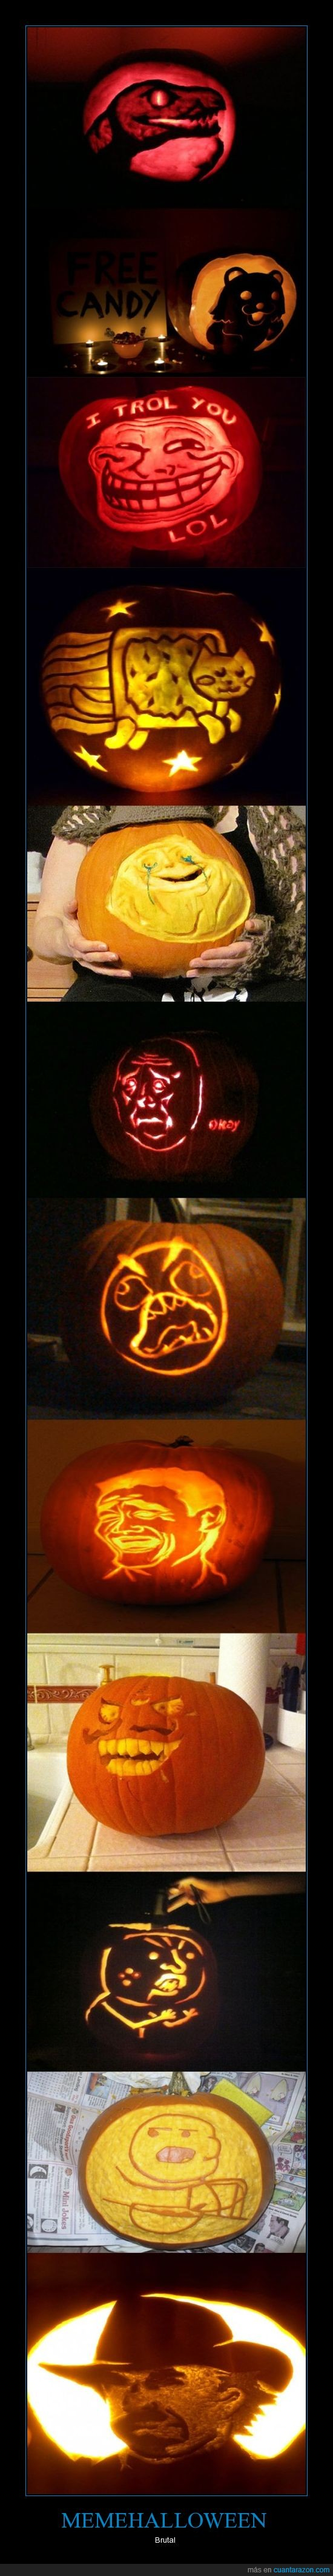 calabazas,chuck norris,halloween,meme